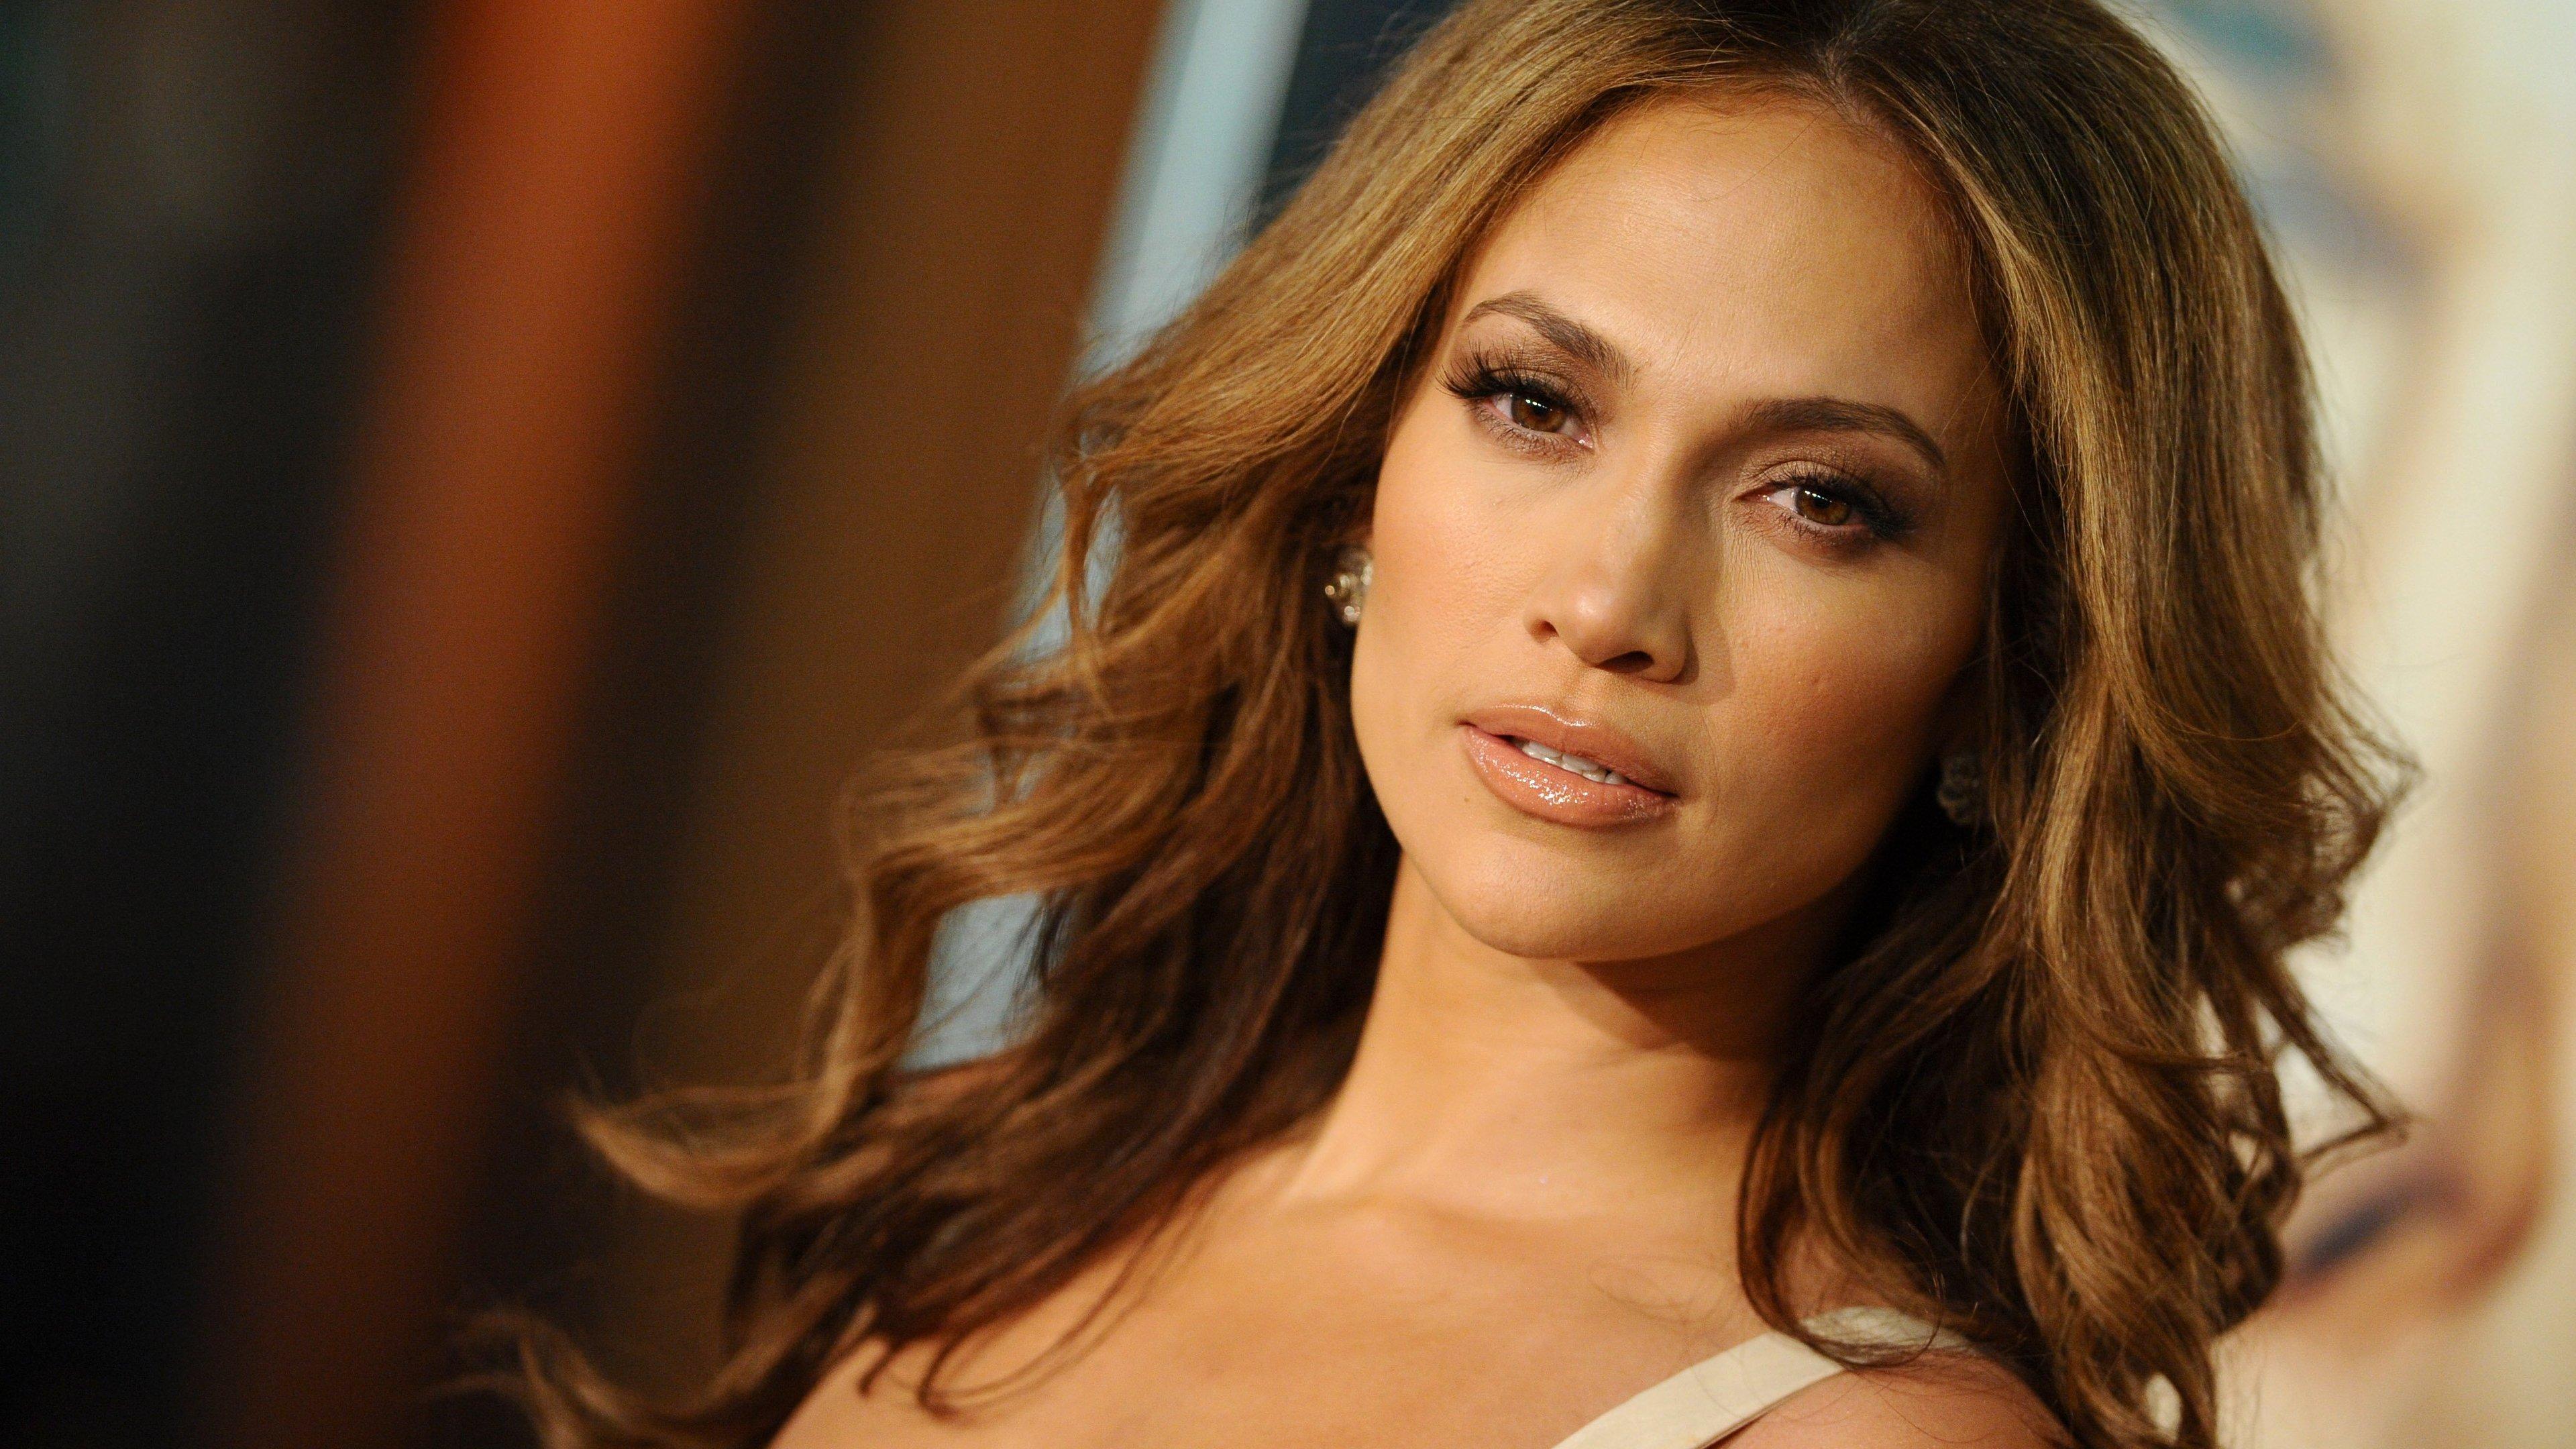 jennifer lopez 4k 1536861297 - Jennifer Lopez 4k - singer wallpapers, music wallpapers, jennifer lopez wallpapers, hd-wallpapers, girls wallpapers, celebrities wallpapers, 4k-wallpapers